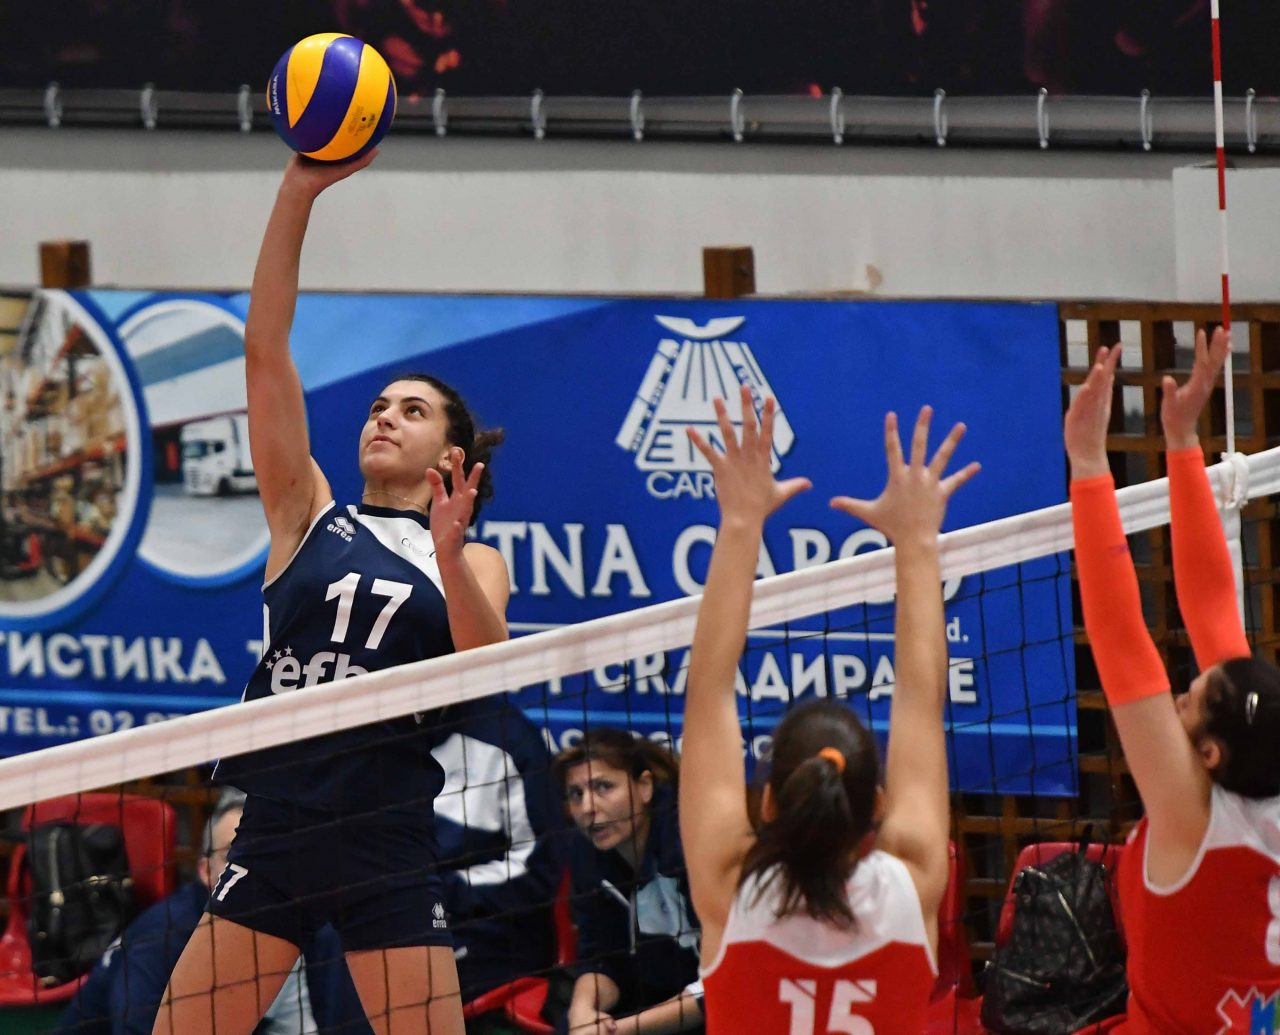 -Левски-волейбол-жени-20-1280x1035.jpg